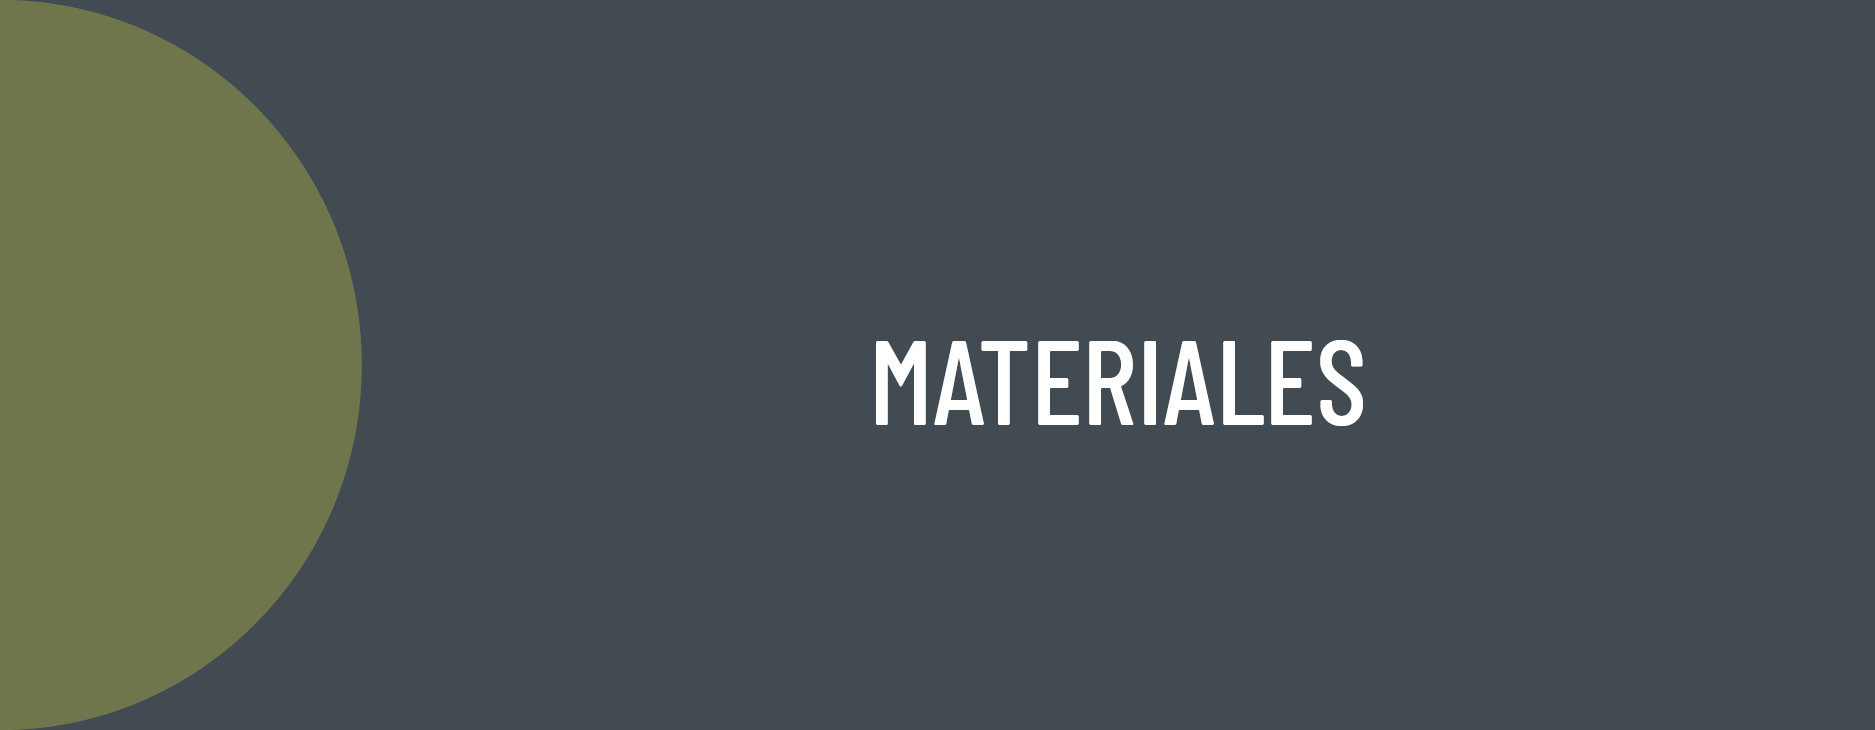 AIDIMME Sectors: Materials